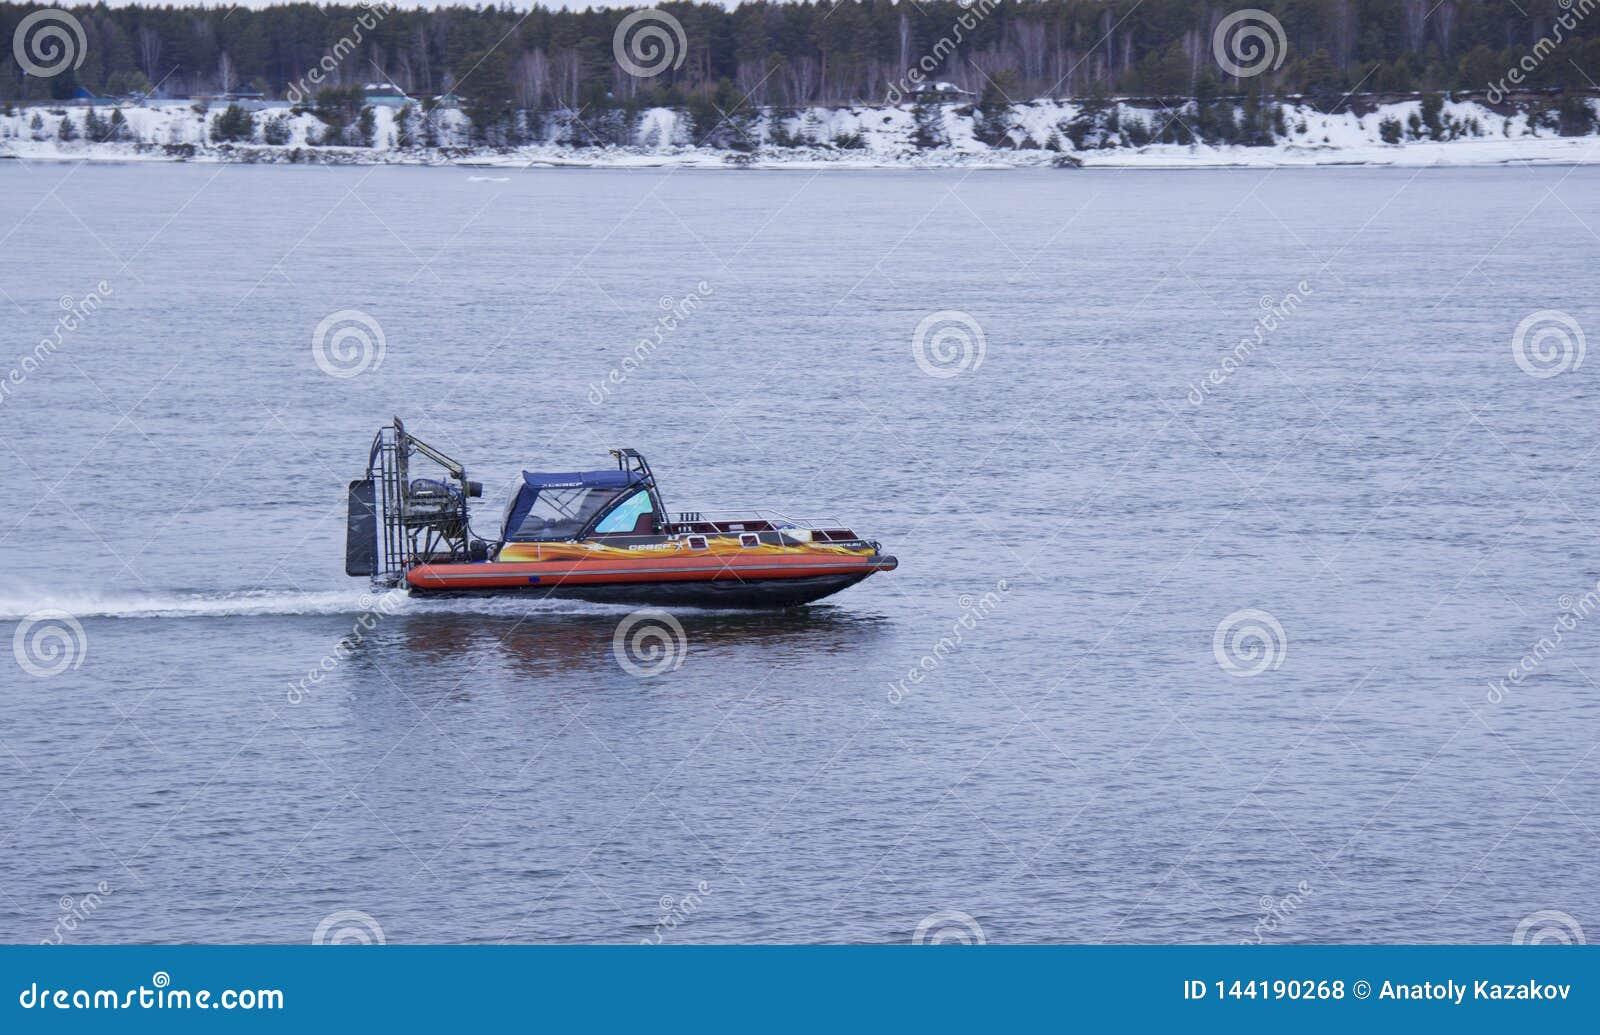 Speedboat hovercraft floating on the river